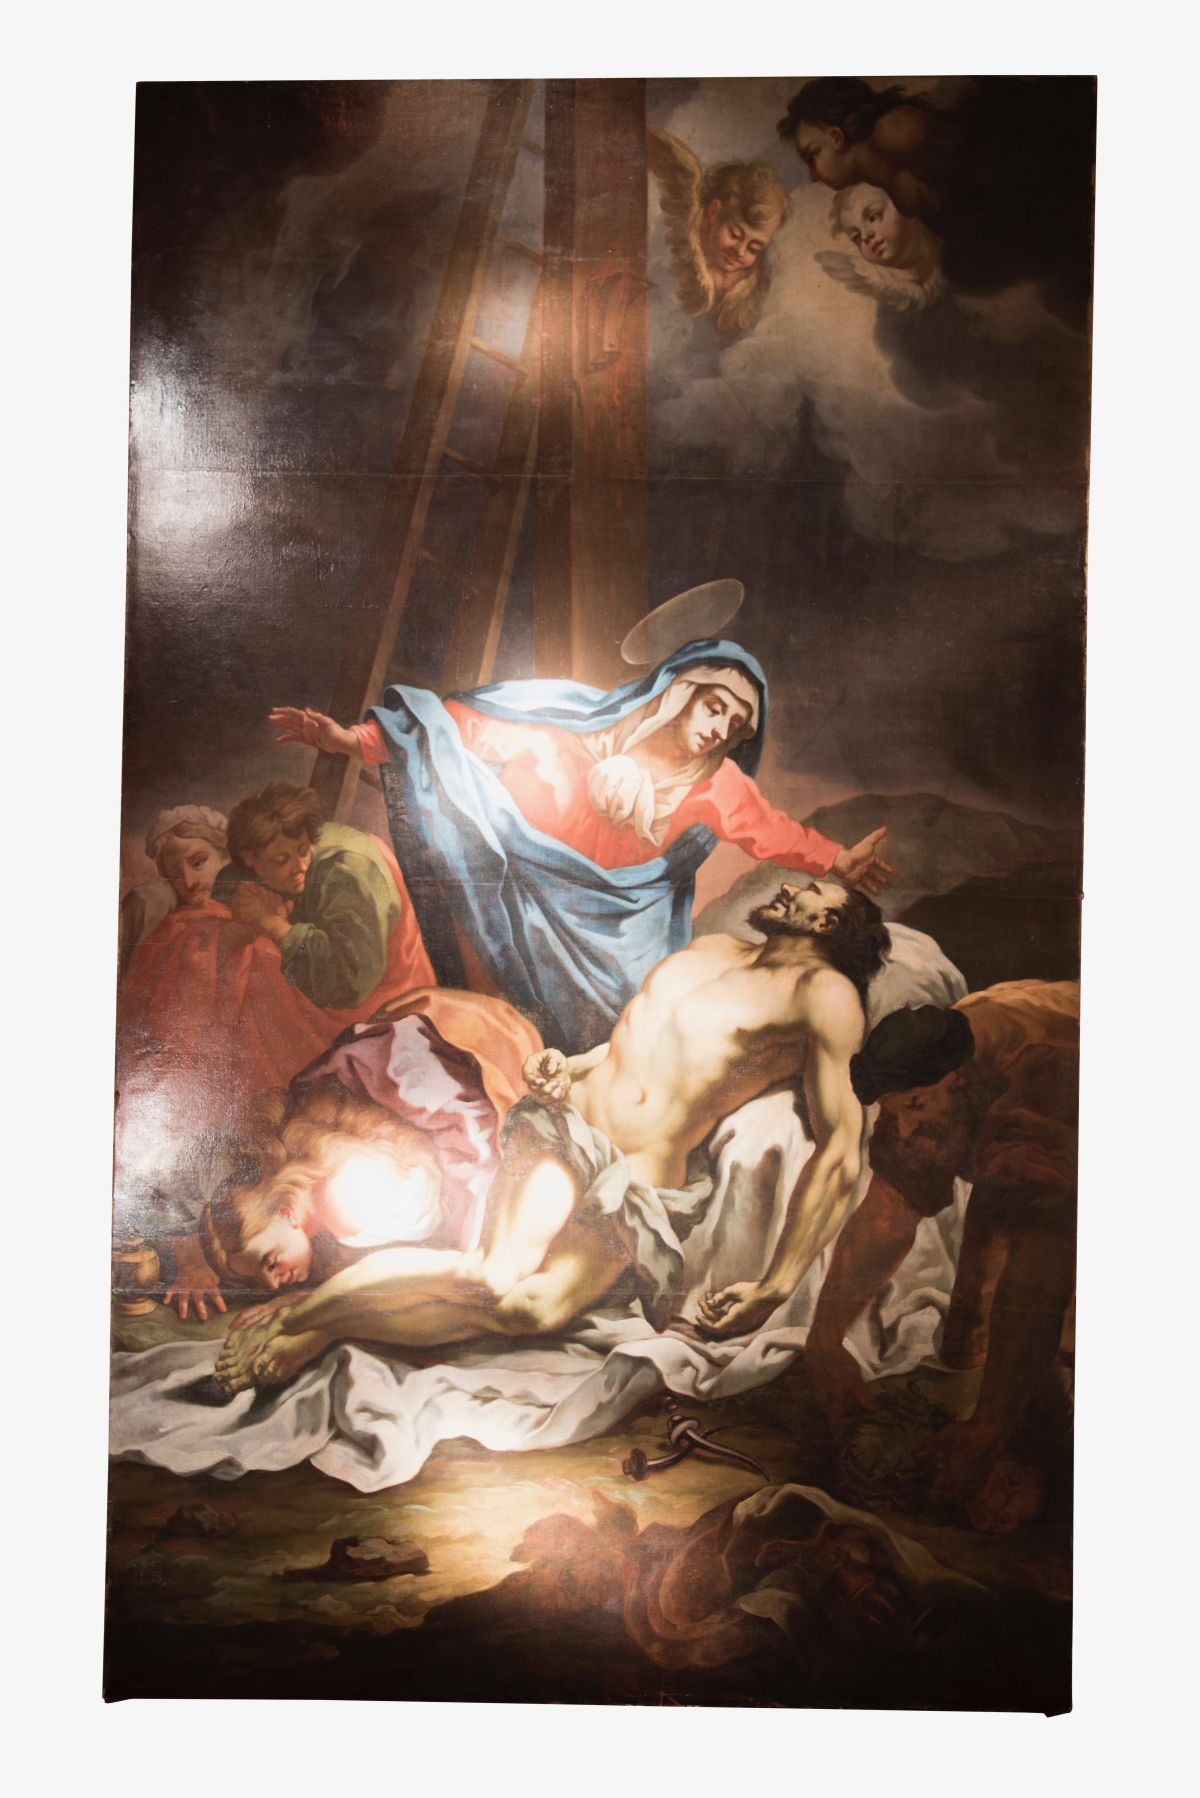 "#118 Austrian baroque painter ""Descent from the Cross"" | Österreichischer Barockmaler ""Kreuzabnahme Christi"" Image"